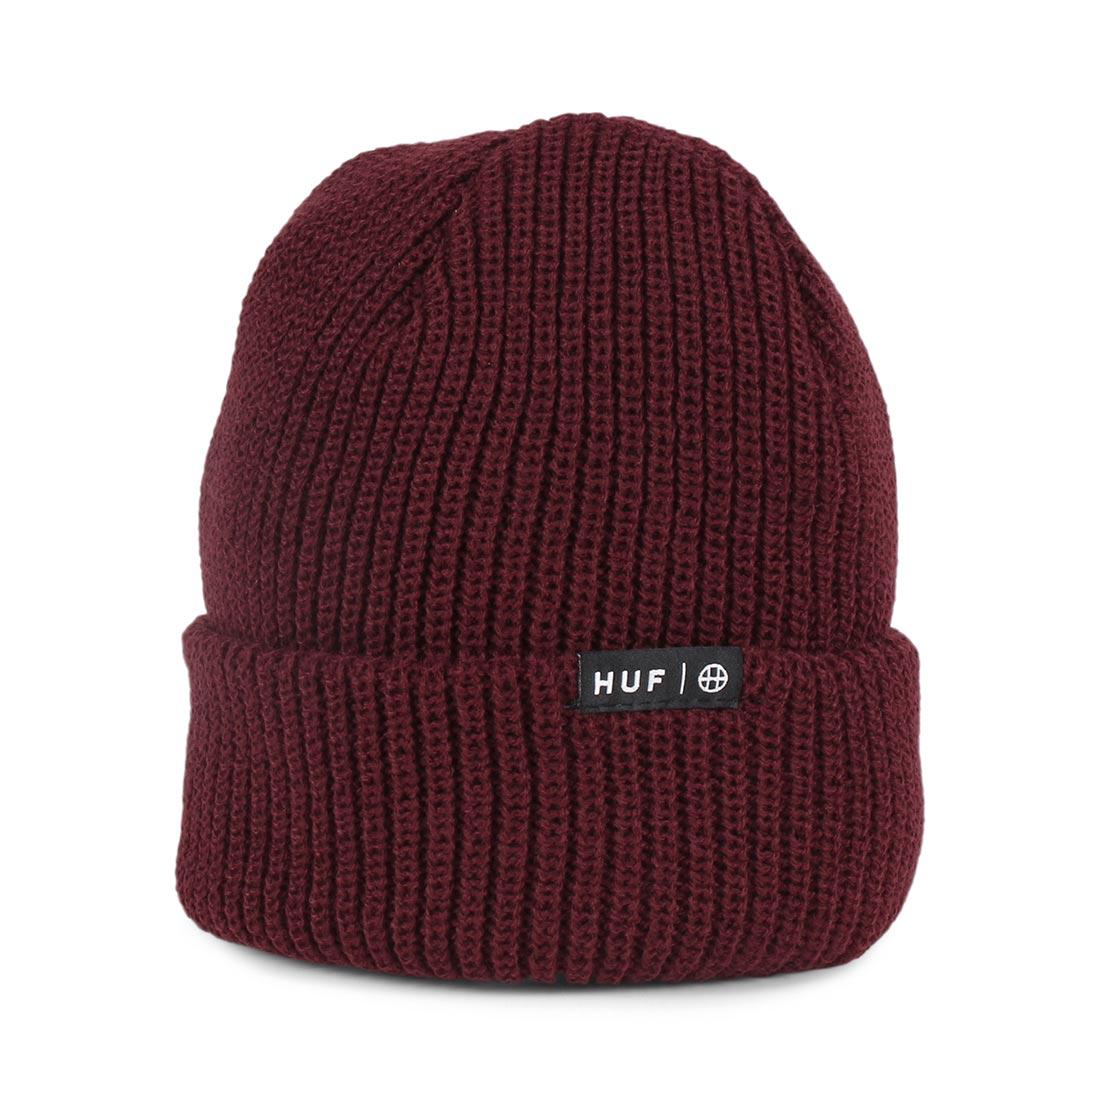 HUF Usual Cuffed Beanie Hat - Port Royal